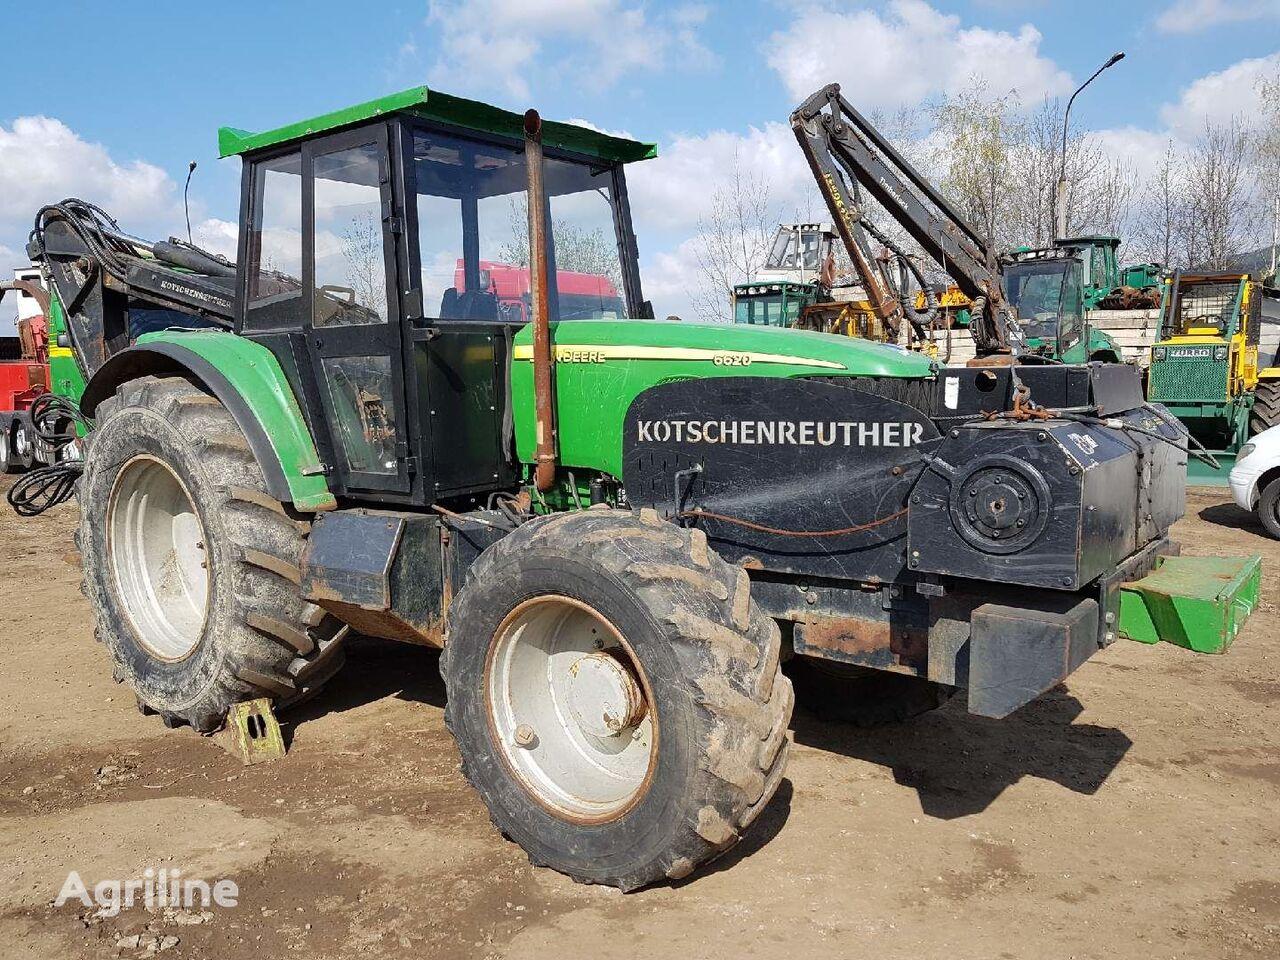 JOHN DEERE 6620 KOTSCHENREUTHER šumarski traktor